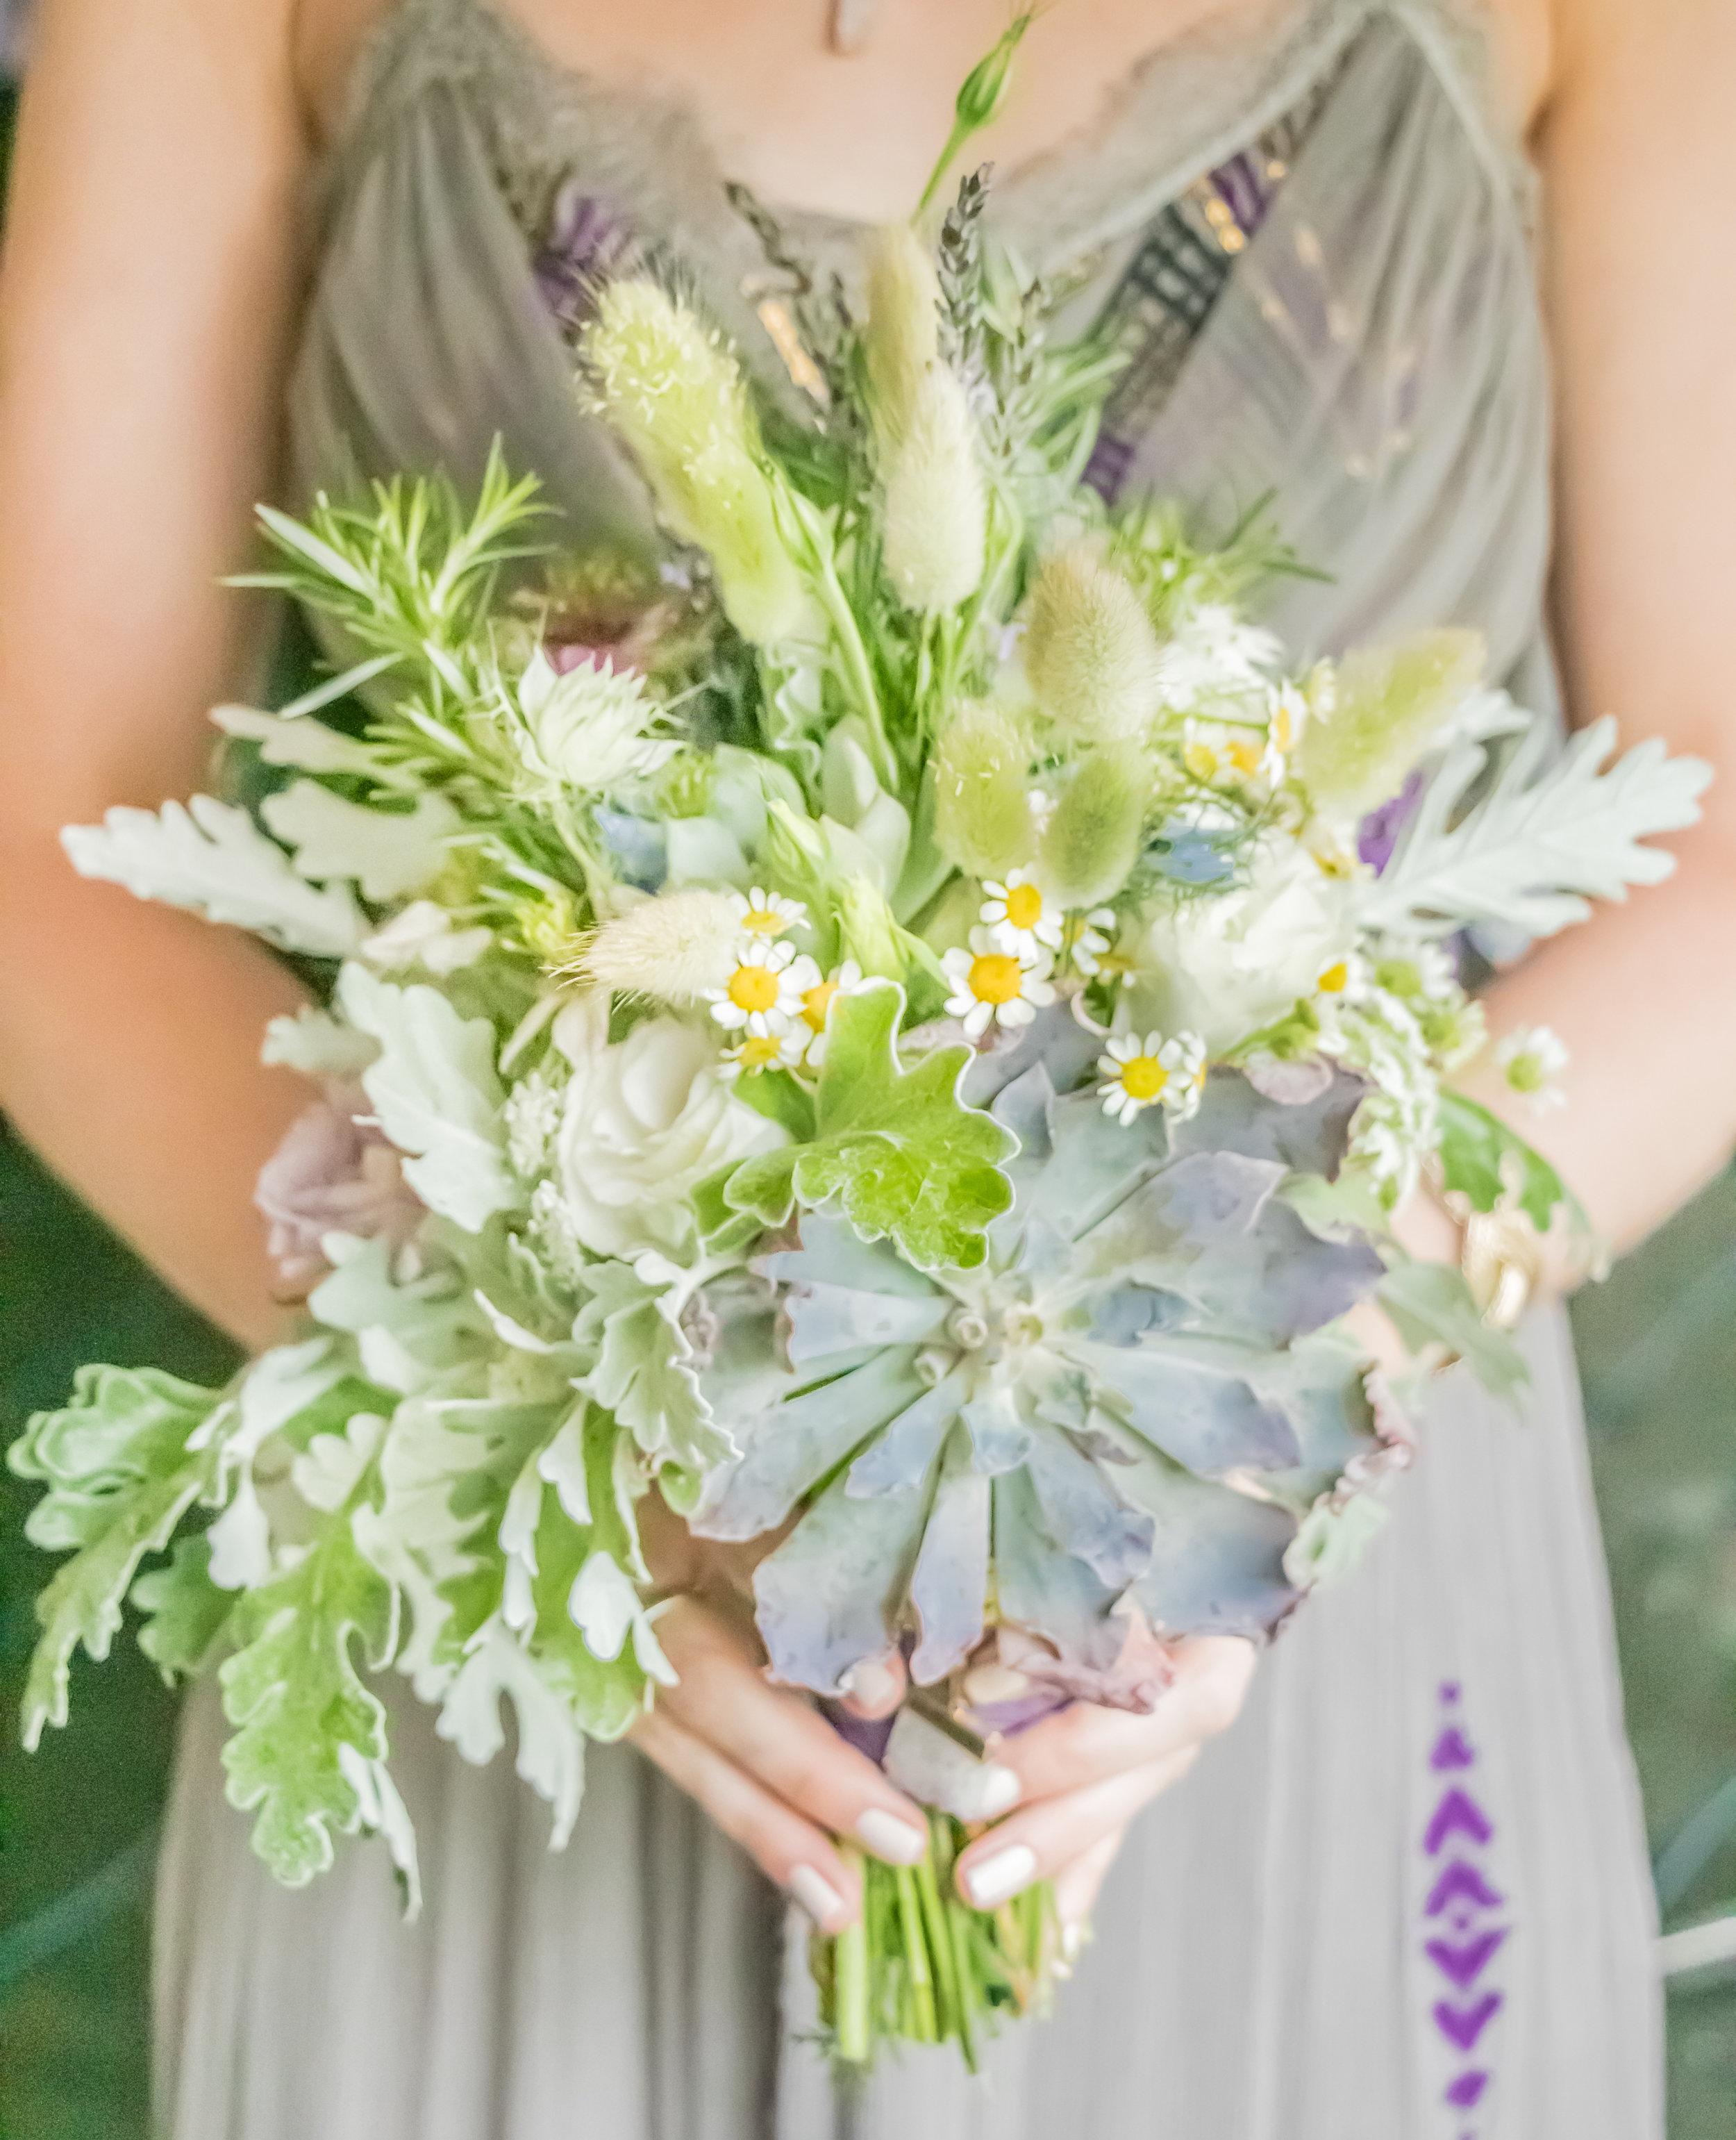 Noreen Bridesmaid Bouquet NW-1.jpg